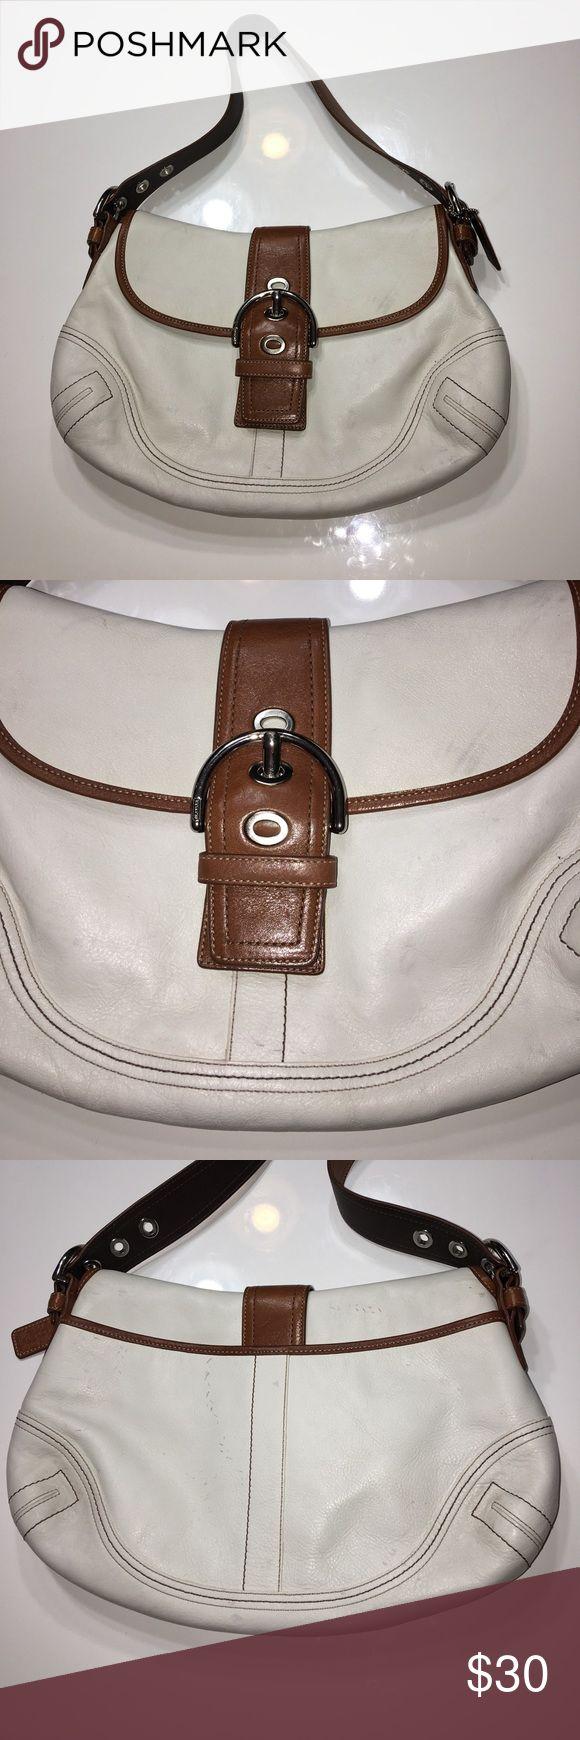 coach leather handbags outlet omv4  Authentic Coach leather handbag purse